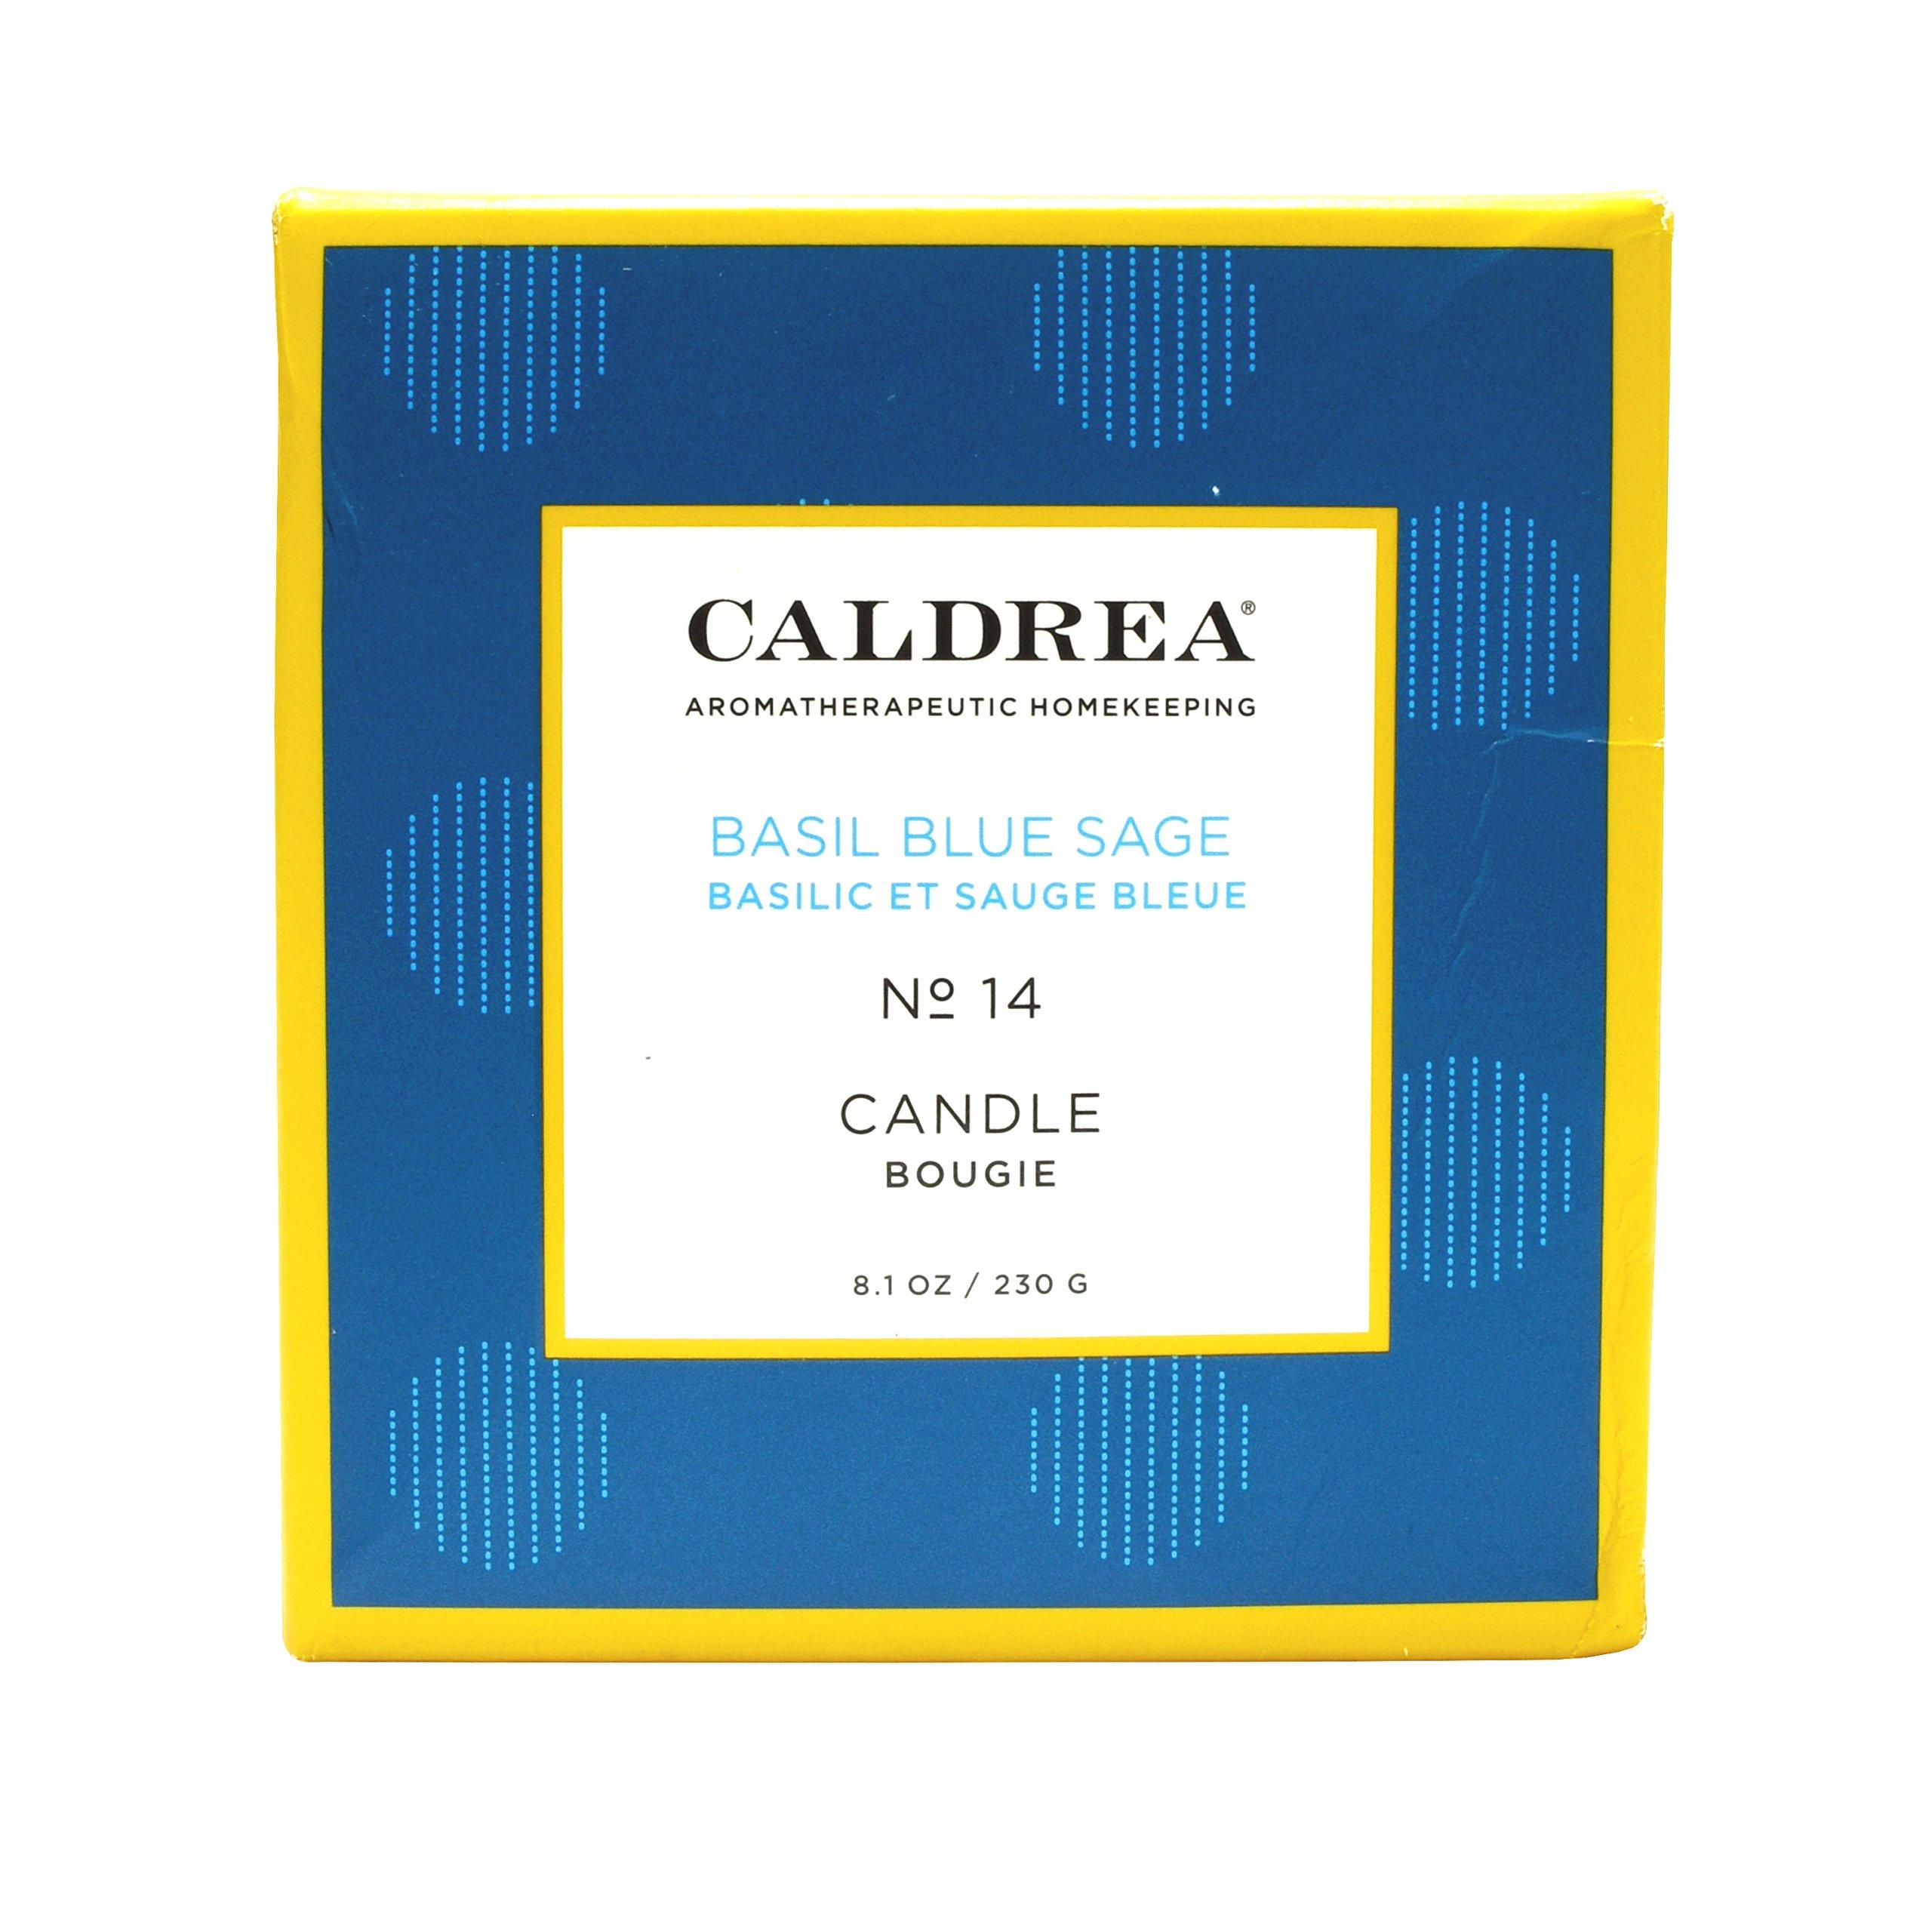 Caldrea Basil Blue Sage Scented Candle 8.1 oz